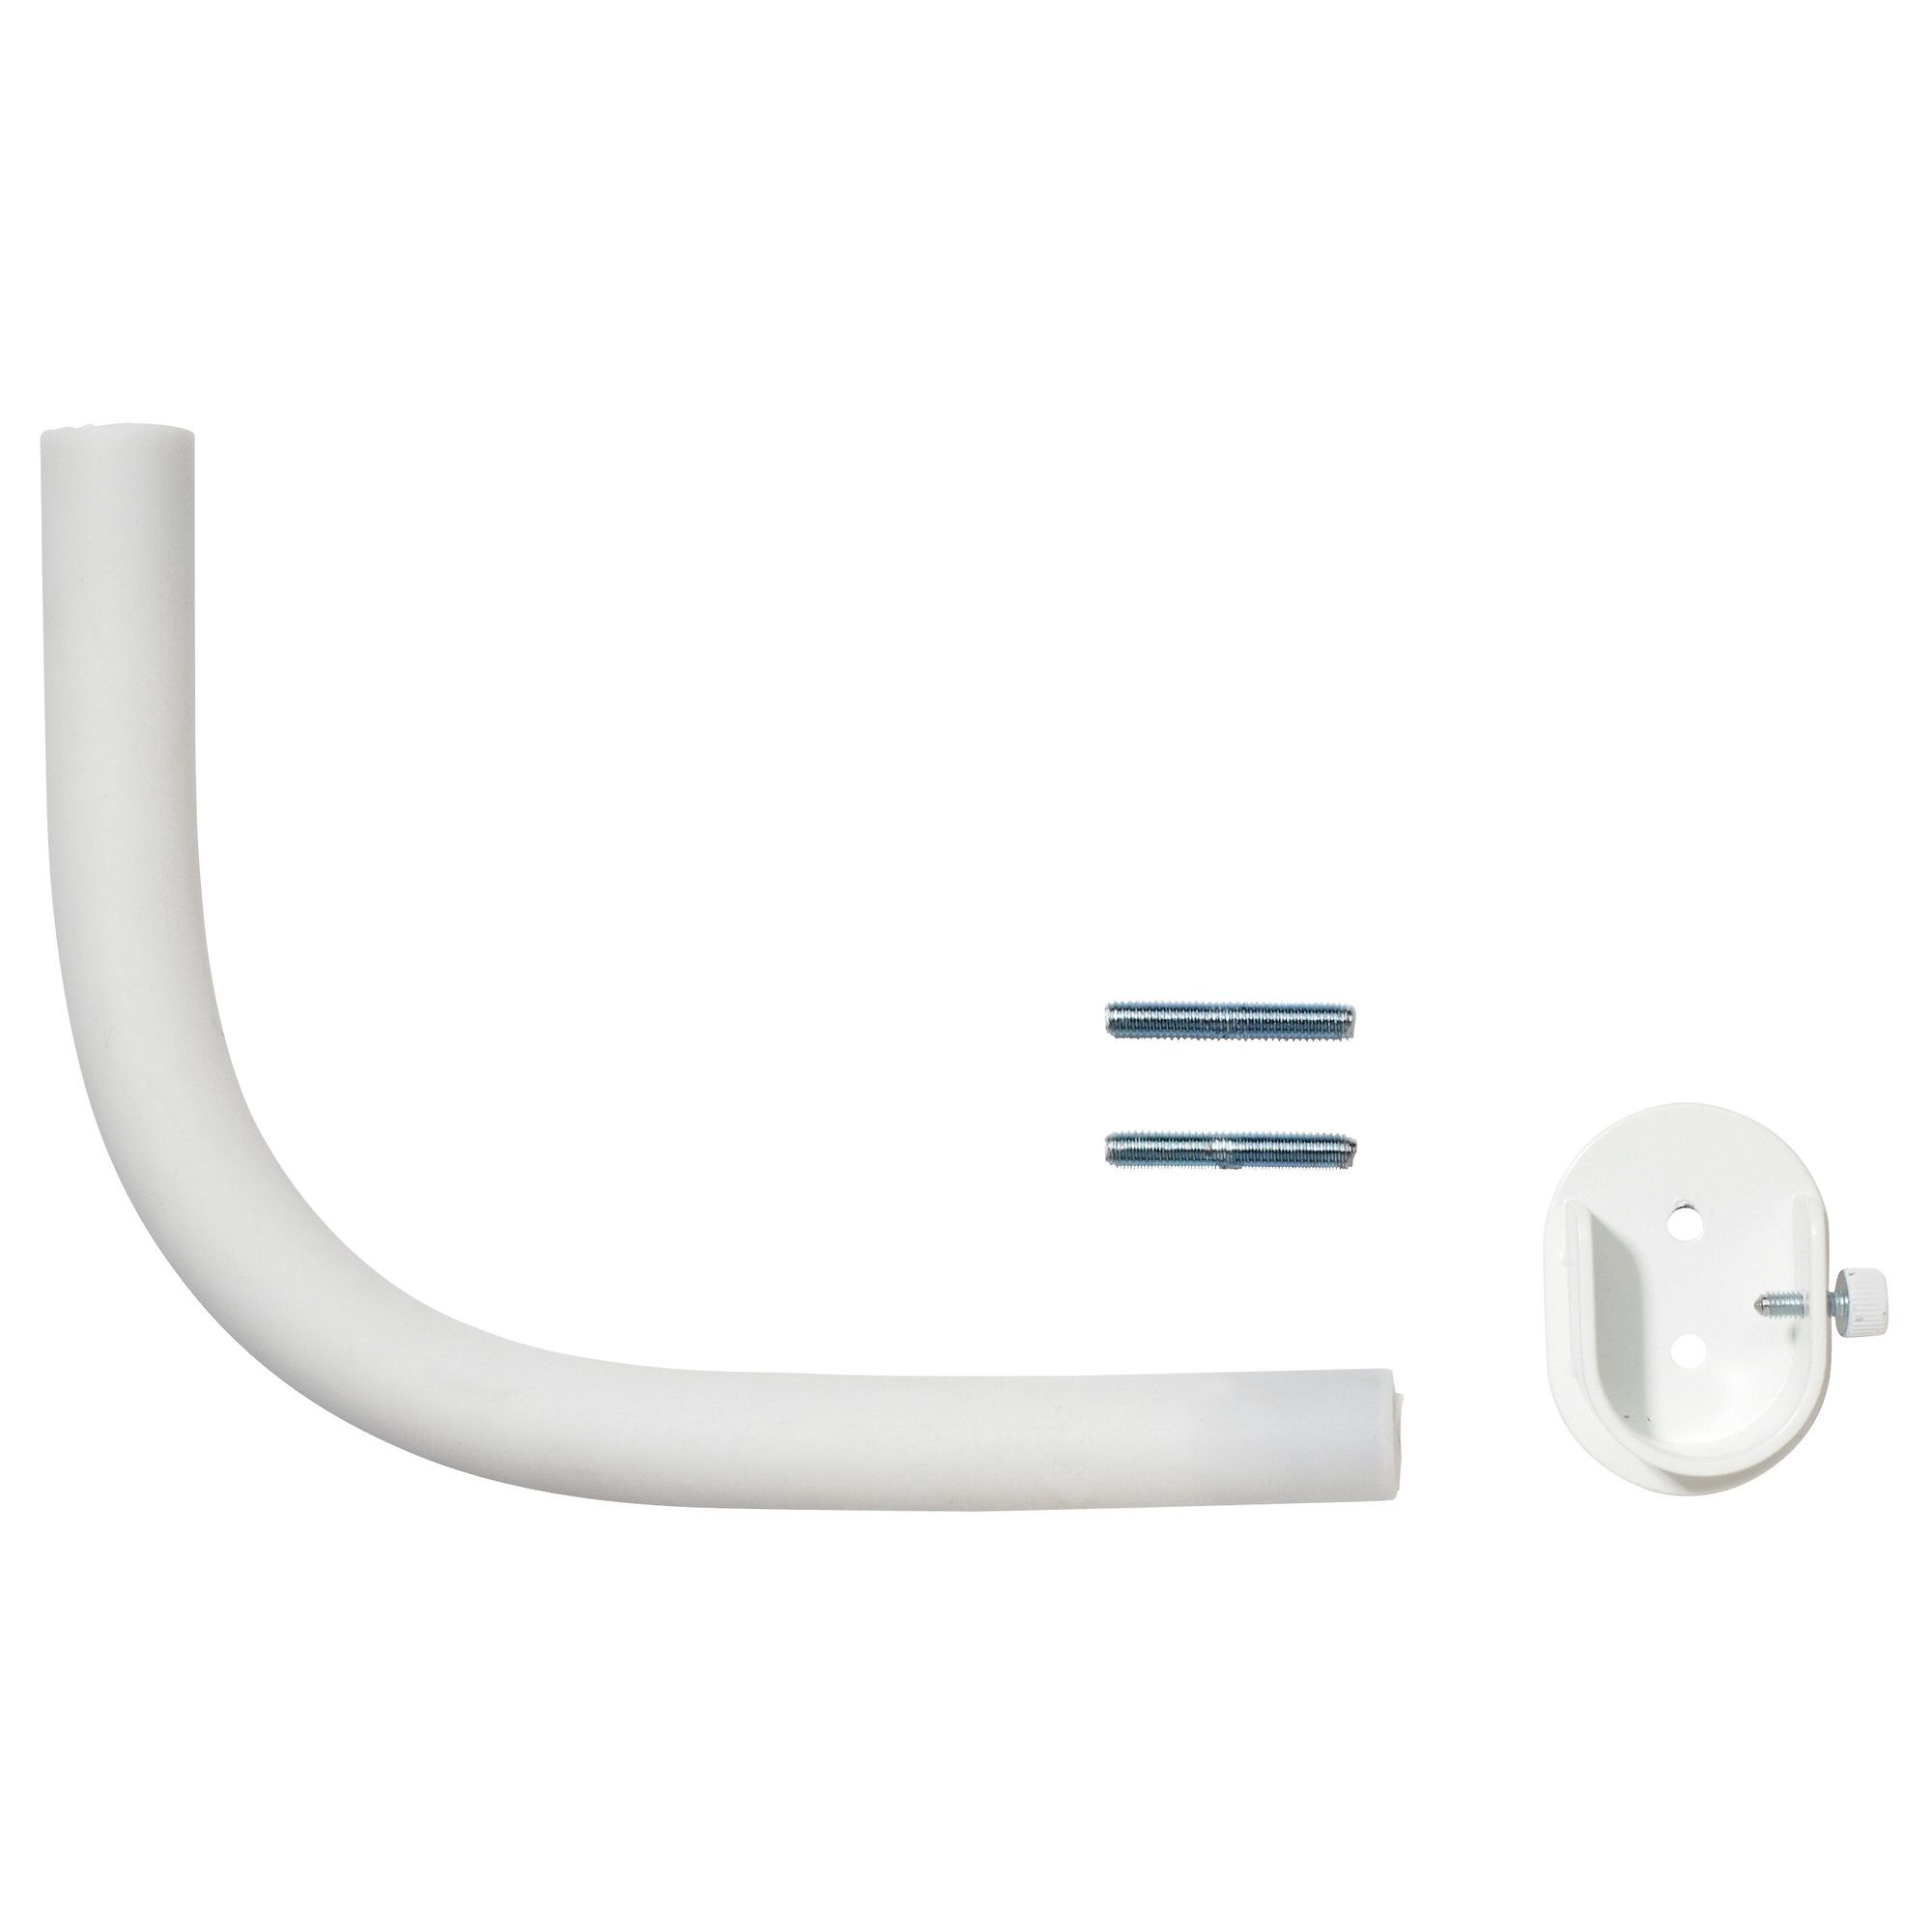 Räcka Curtain Rod Corner Connector White Ikea Things I Want